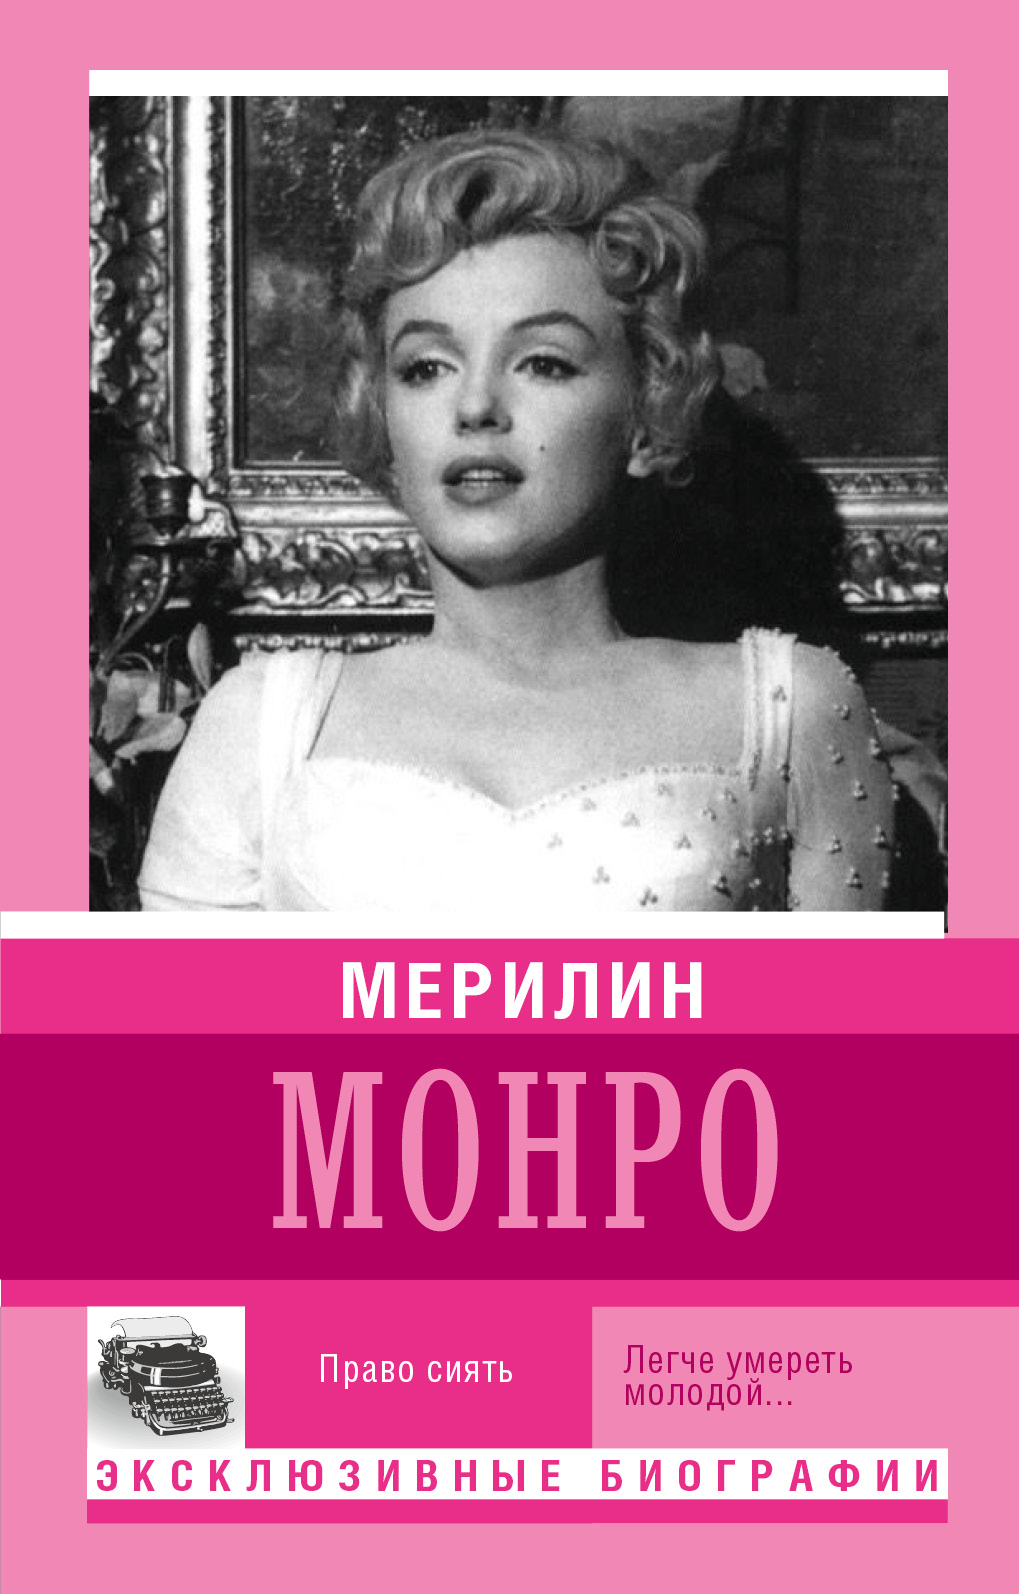 Мишаненкова Е.А. Мерилин Монро занавеска для душа мерилин монро